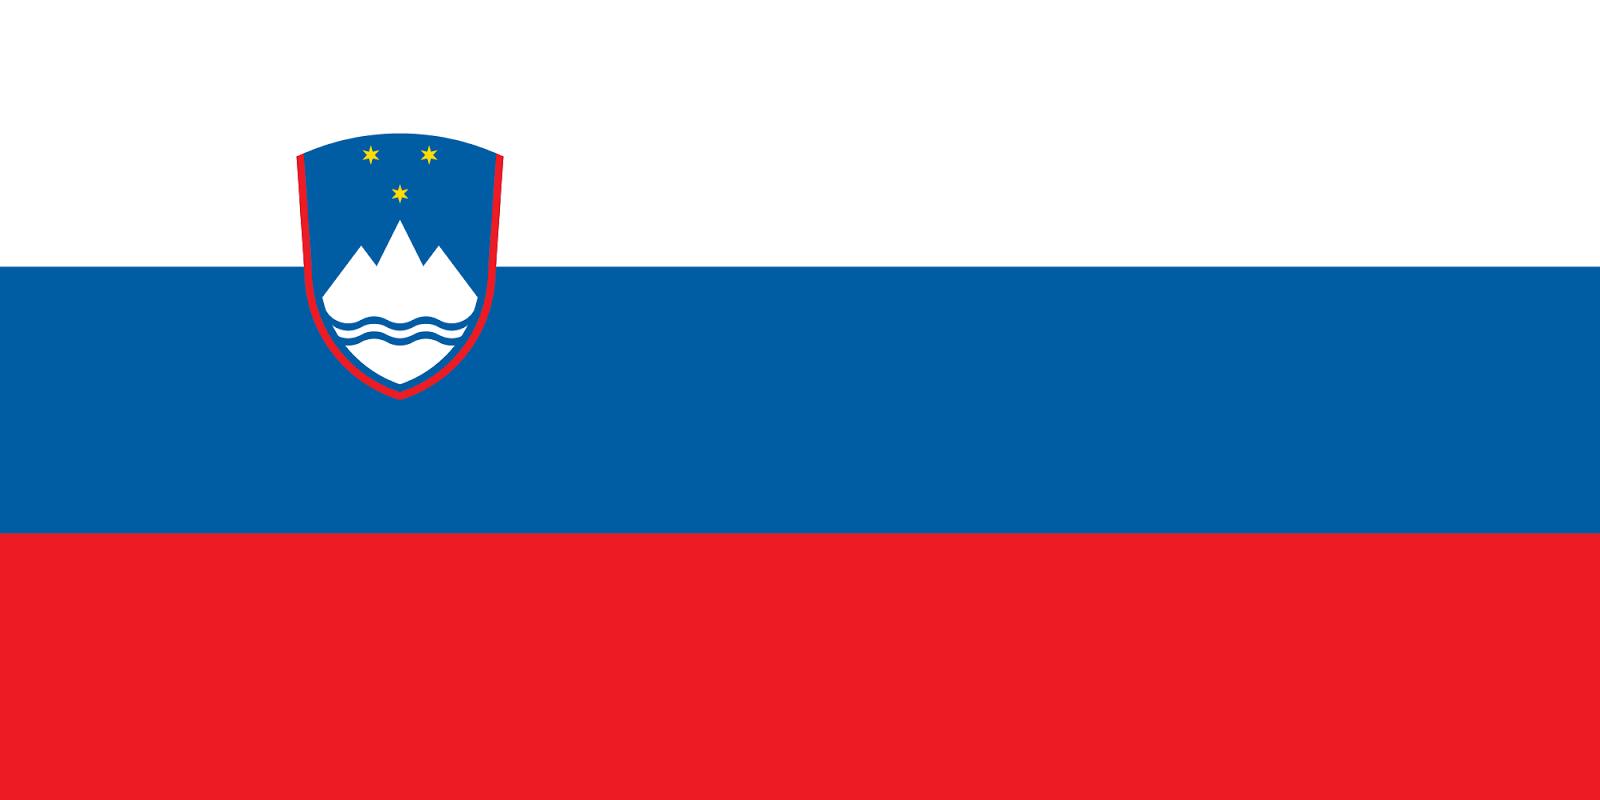 http://carbrandsincurrentproduction.blogspot.com.es/search/label/Slovenia